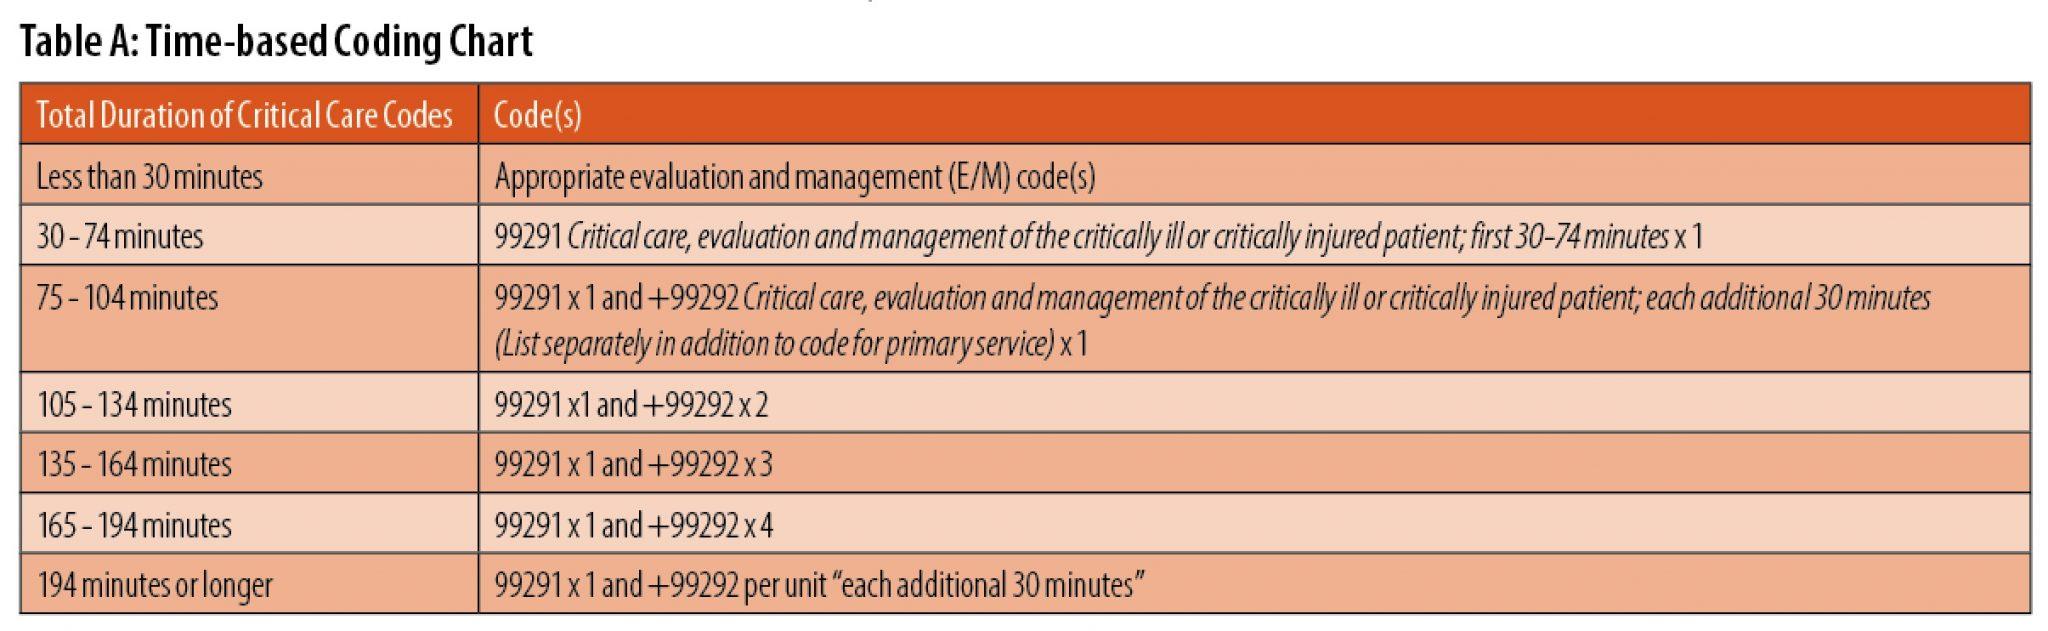 critical care table a